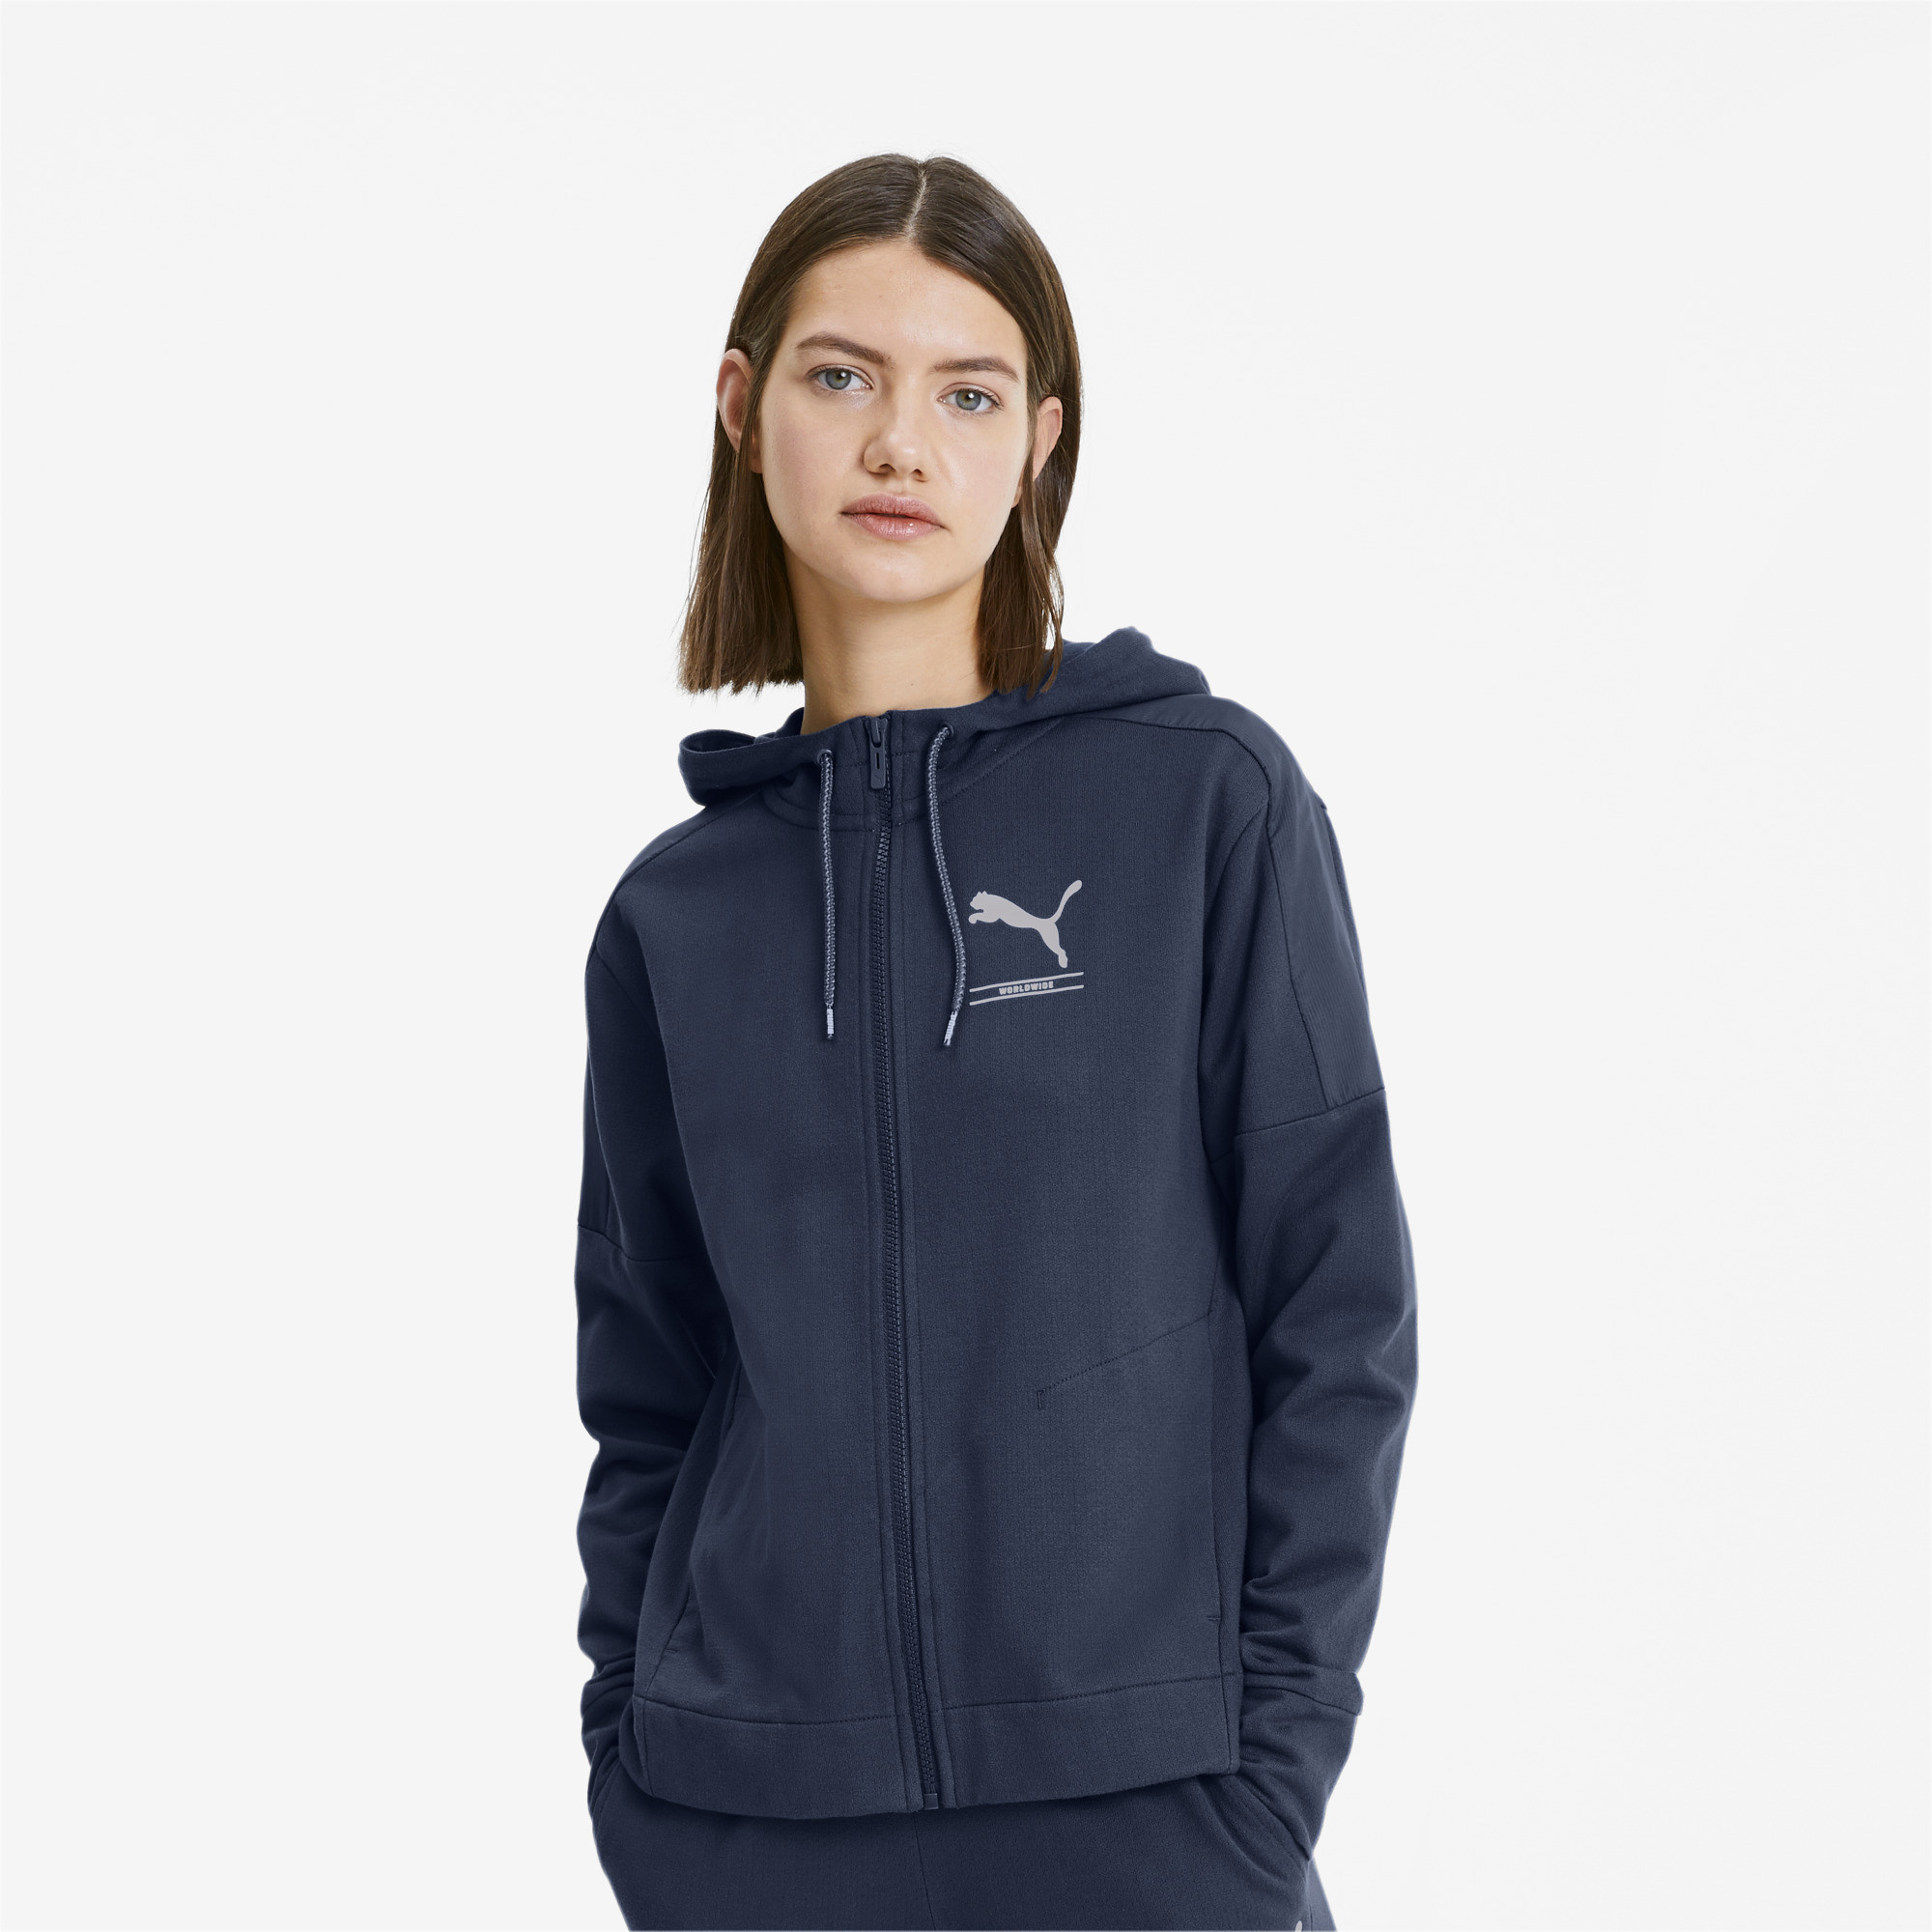 PUMA-NU-TILITY-Women-039-s-Full-Zip-Hoodie-Women-Sweat-Basics miniatuur 4